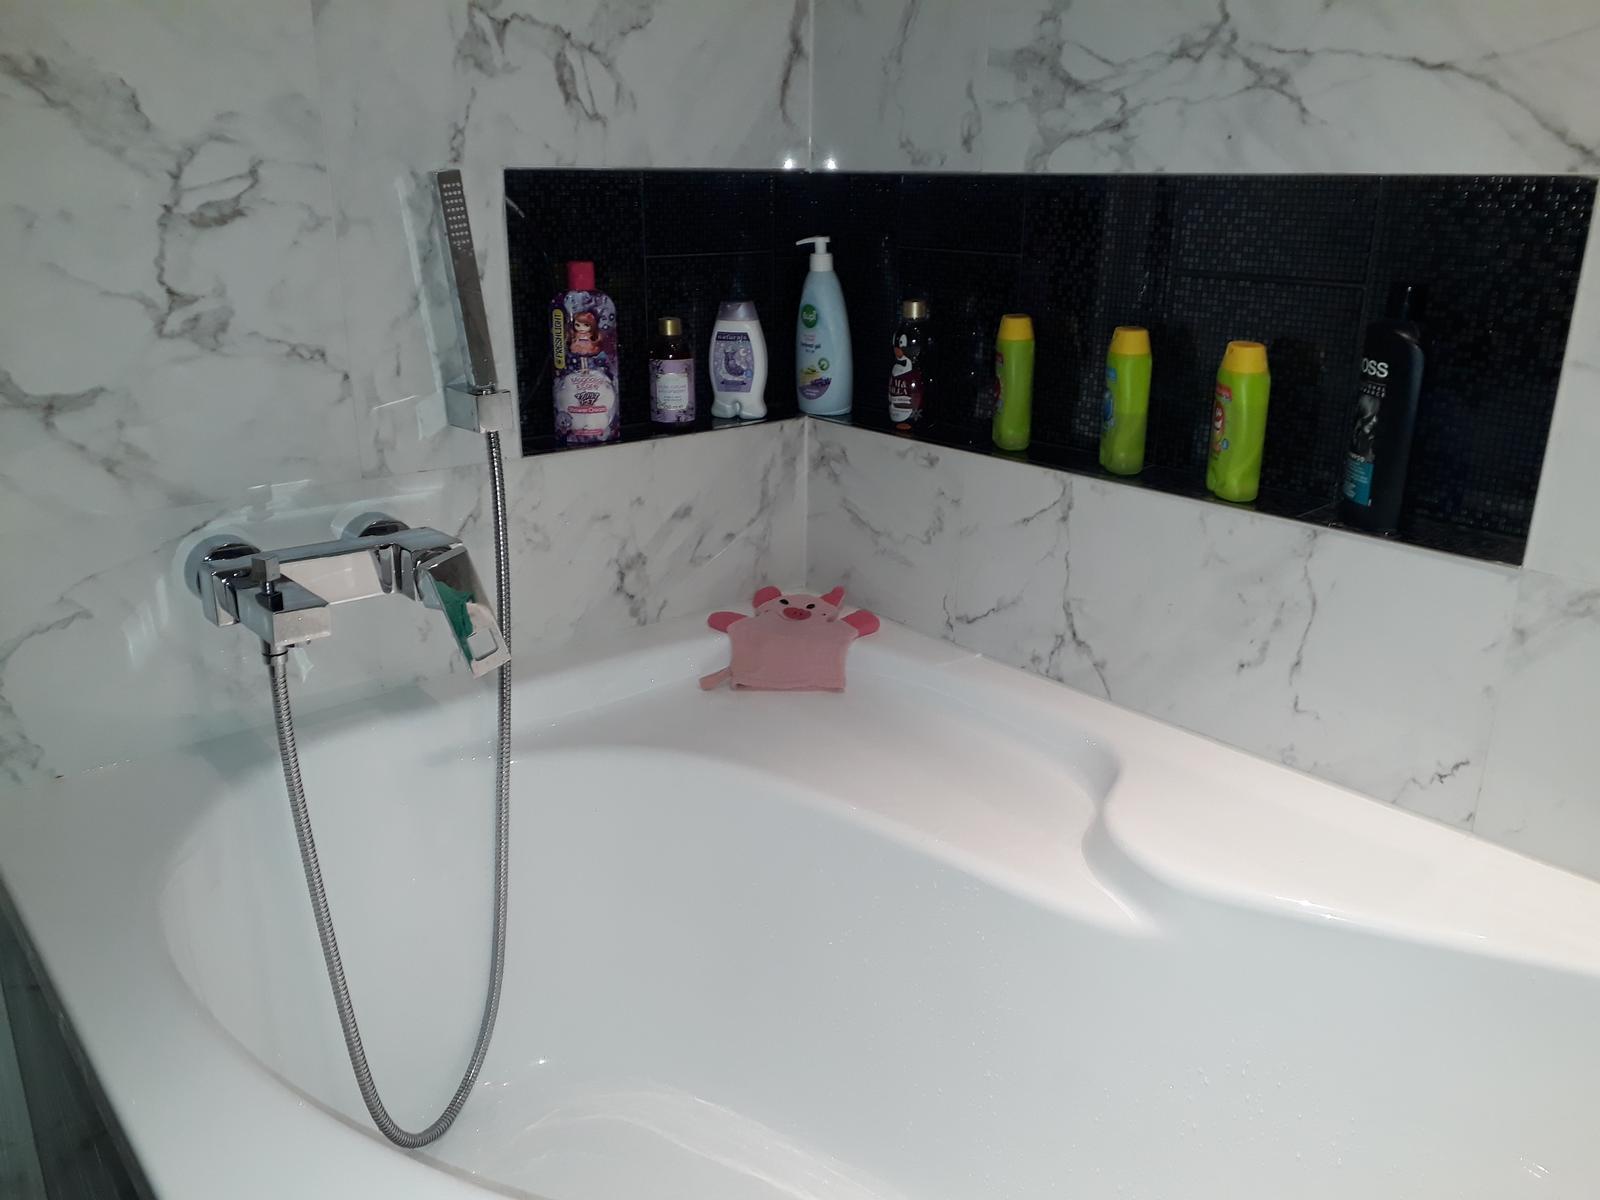 Zaciname stavat nas sen - Konecne drziaky na sprchu namontovane